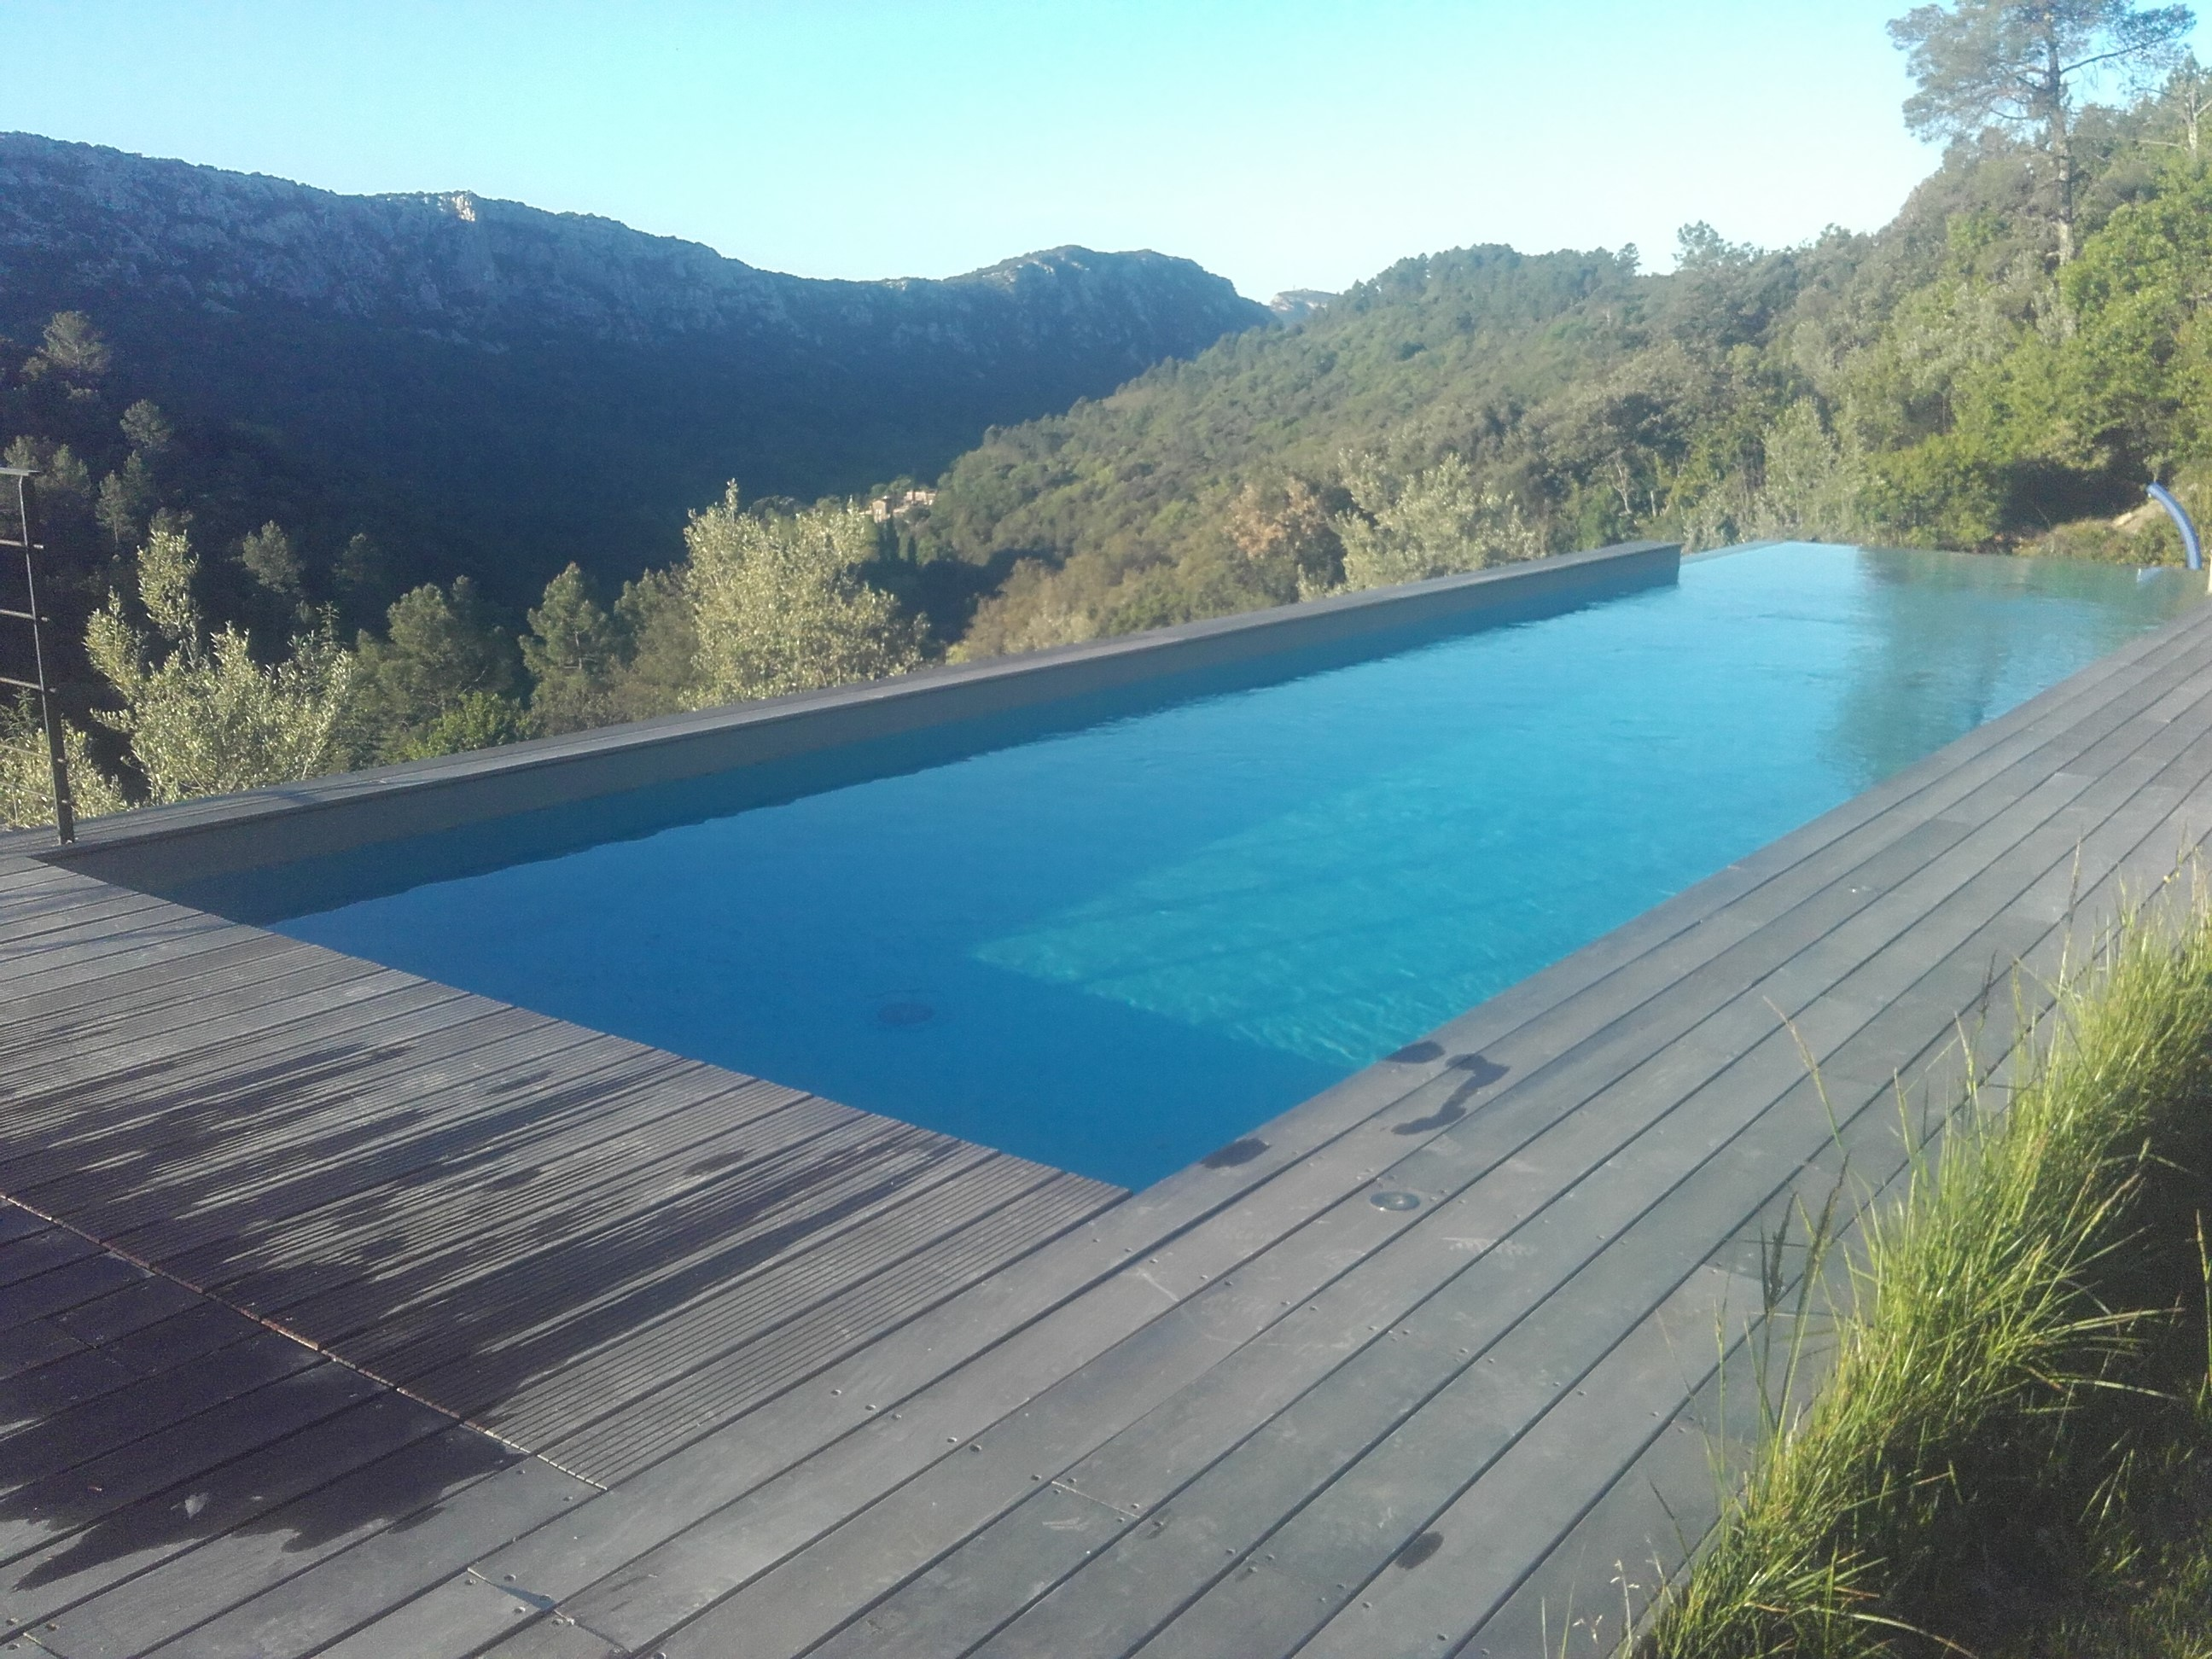 Piscine couloir de nage bassin sarl plantier for Piscine bassin de nage